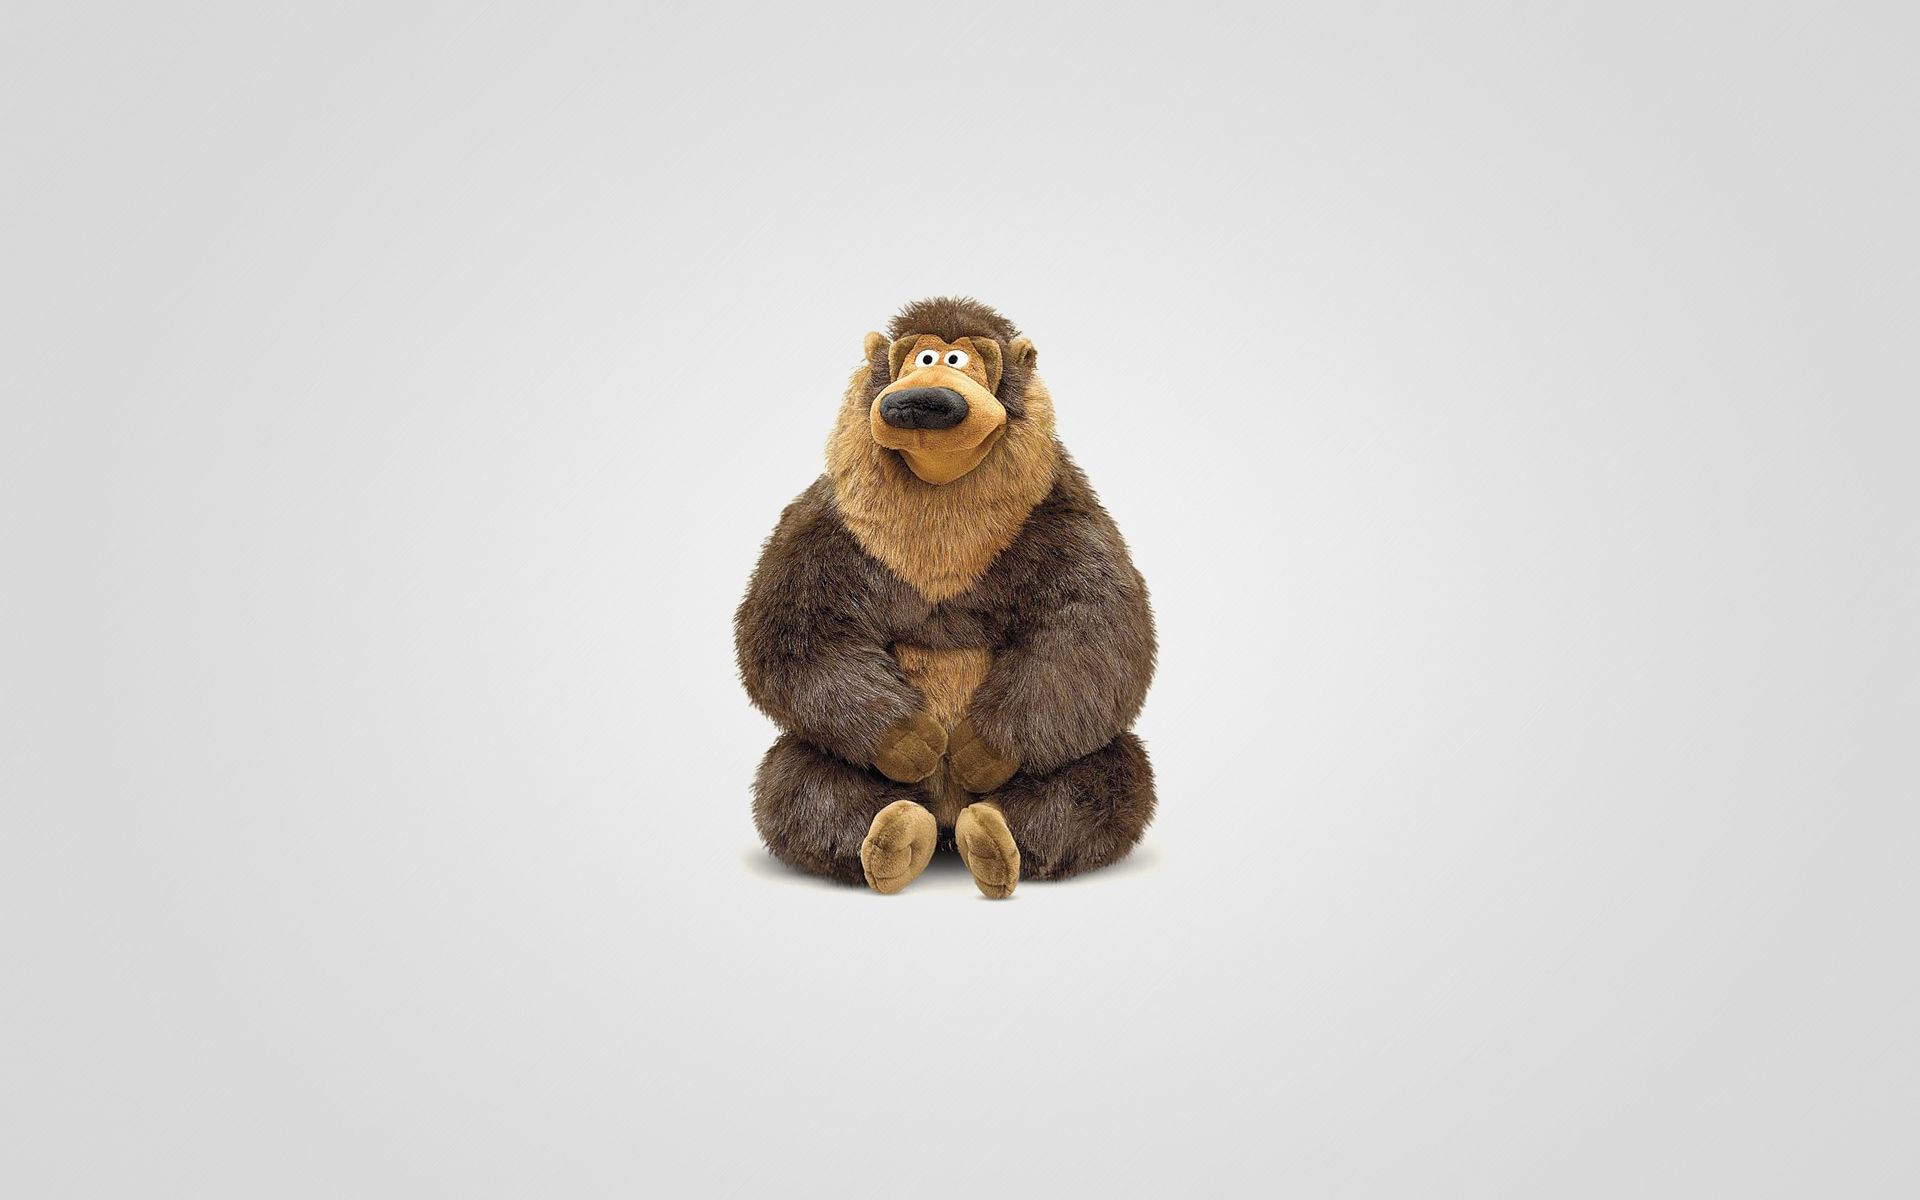 медведь картинка минимализм фейерверк